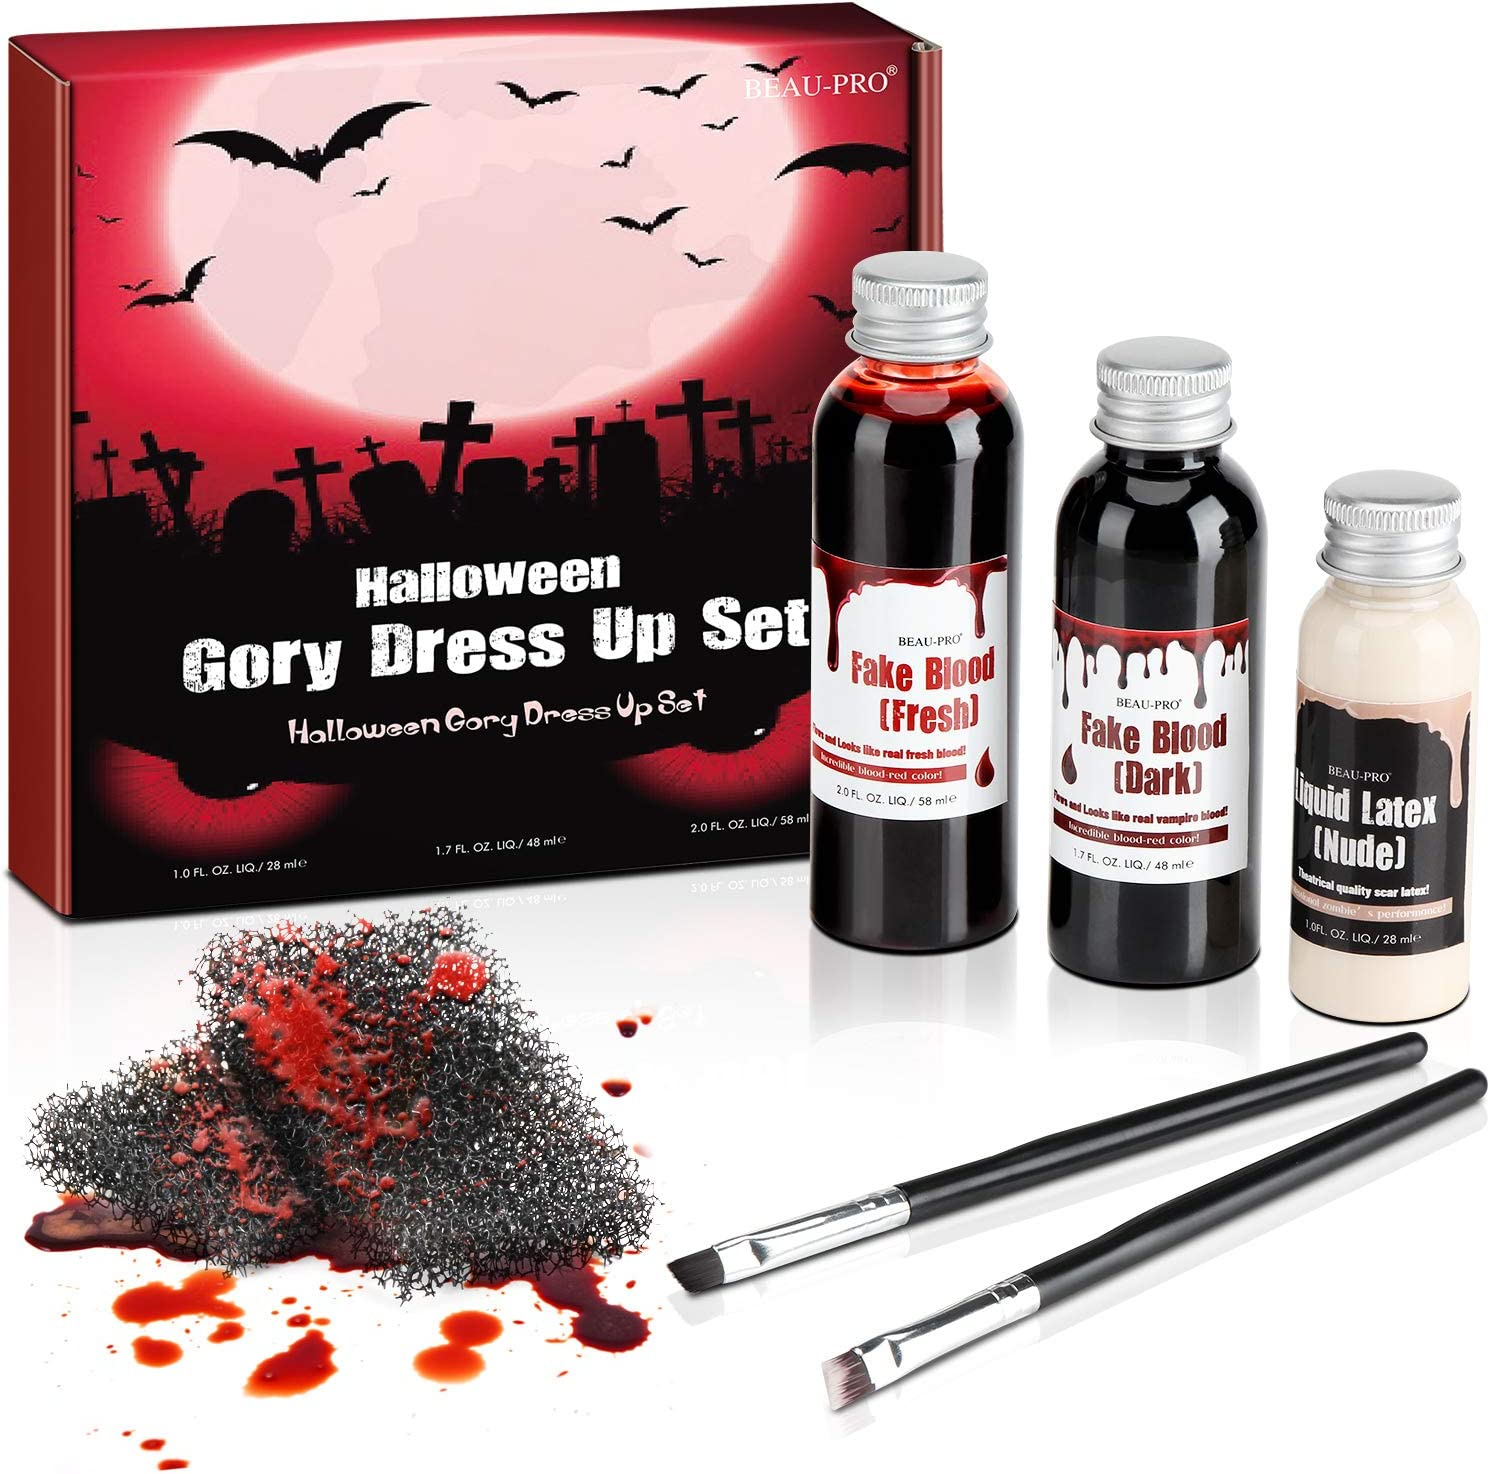 Sangre falsa con 1 * 50 ml de sangre rojo oscuro, 1 * 60 ml de sangre fresca y 1 * 30 ml de maquillaje líquido de látex sfx de Fright Fest